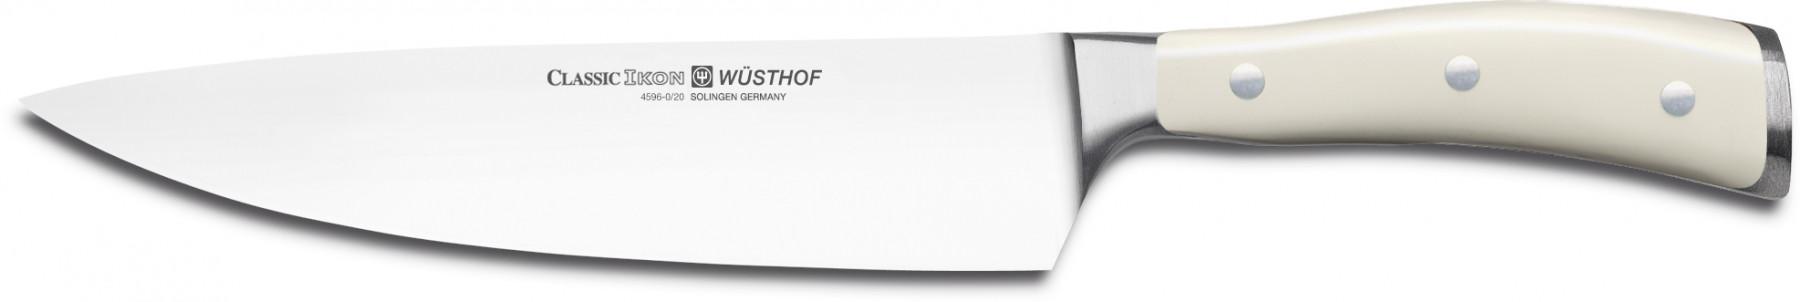 Wüsthof Dreizack Classic Ikon Creme Messerblock 9tlg.